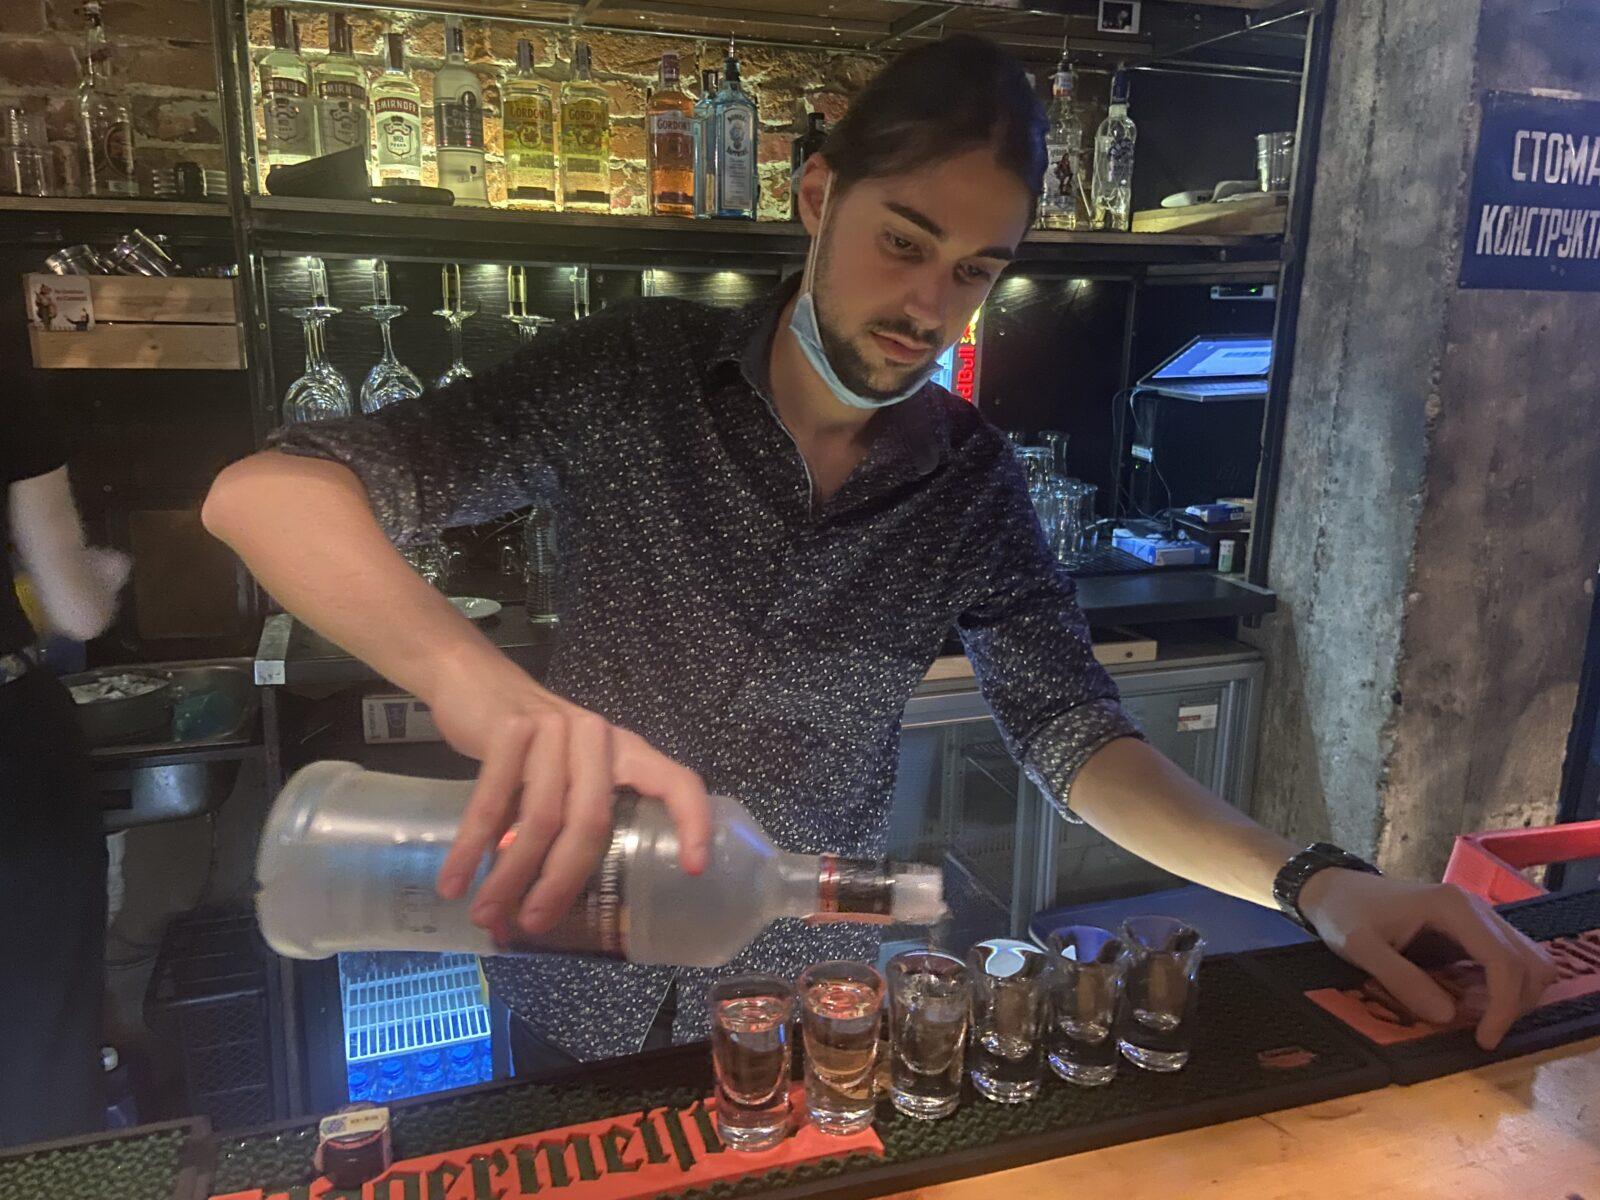 A bartender prepares our shots at Stroeja.